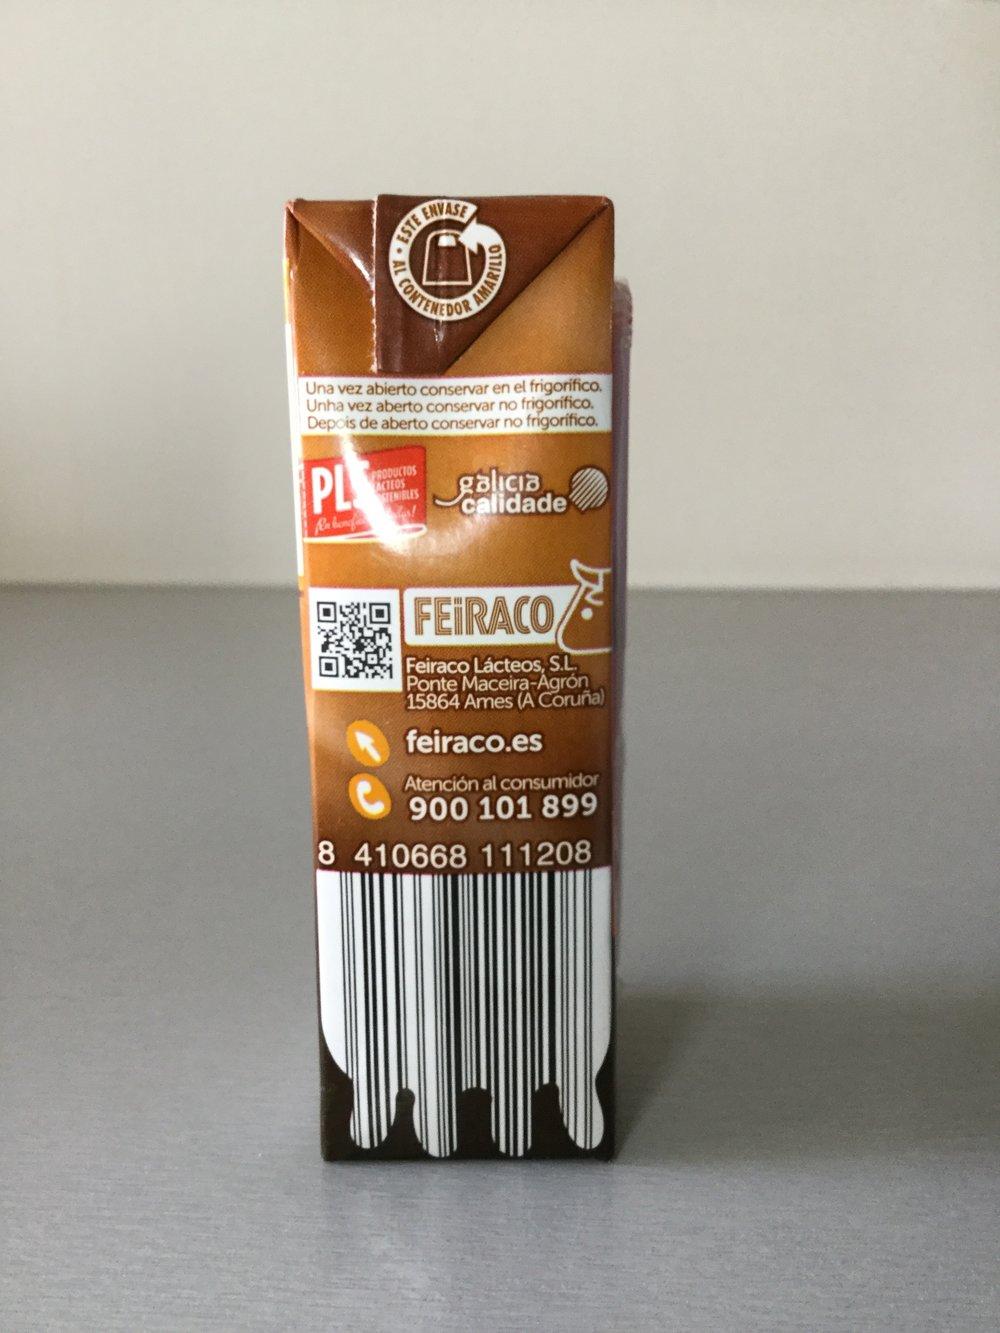 Feiraco Batido De Chocolate Side 2